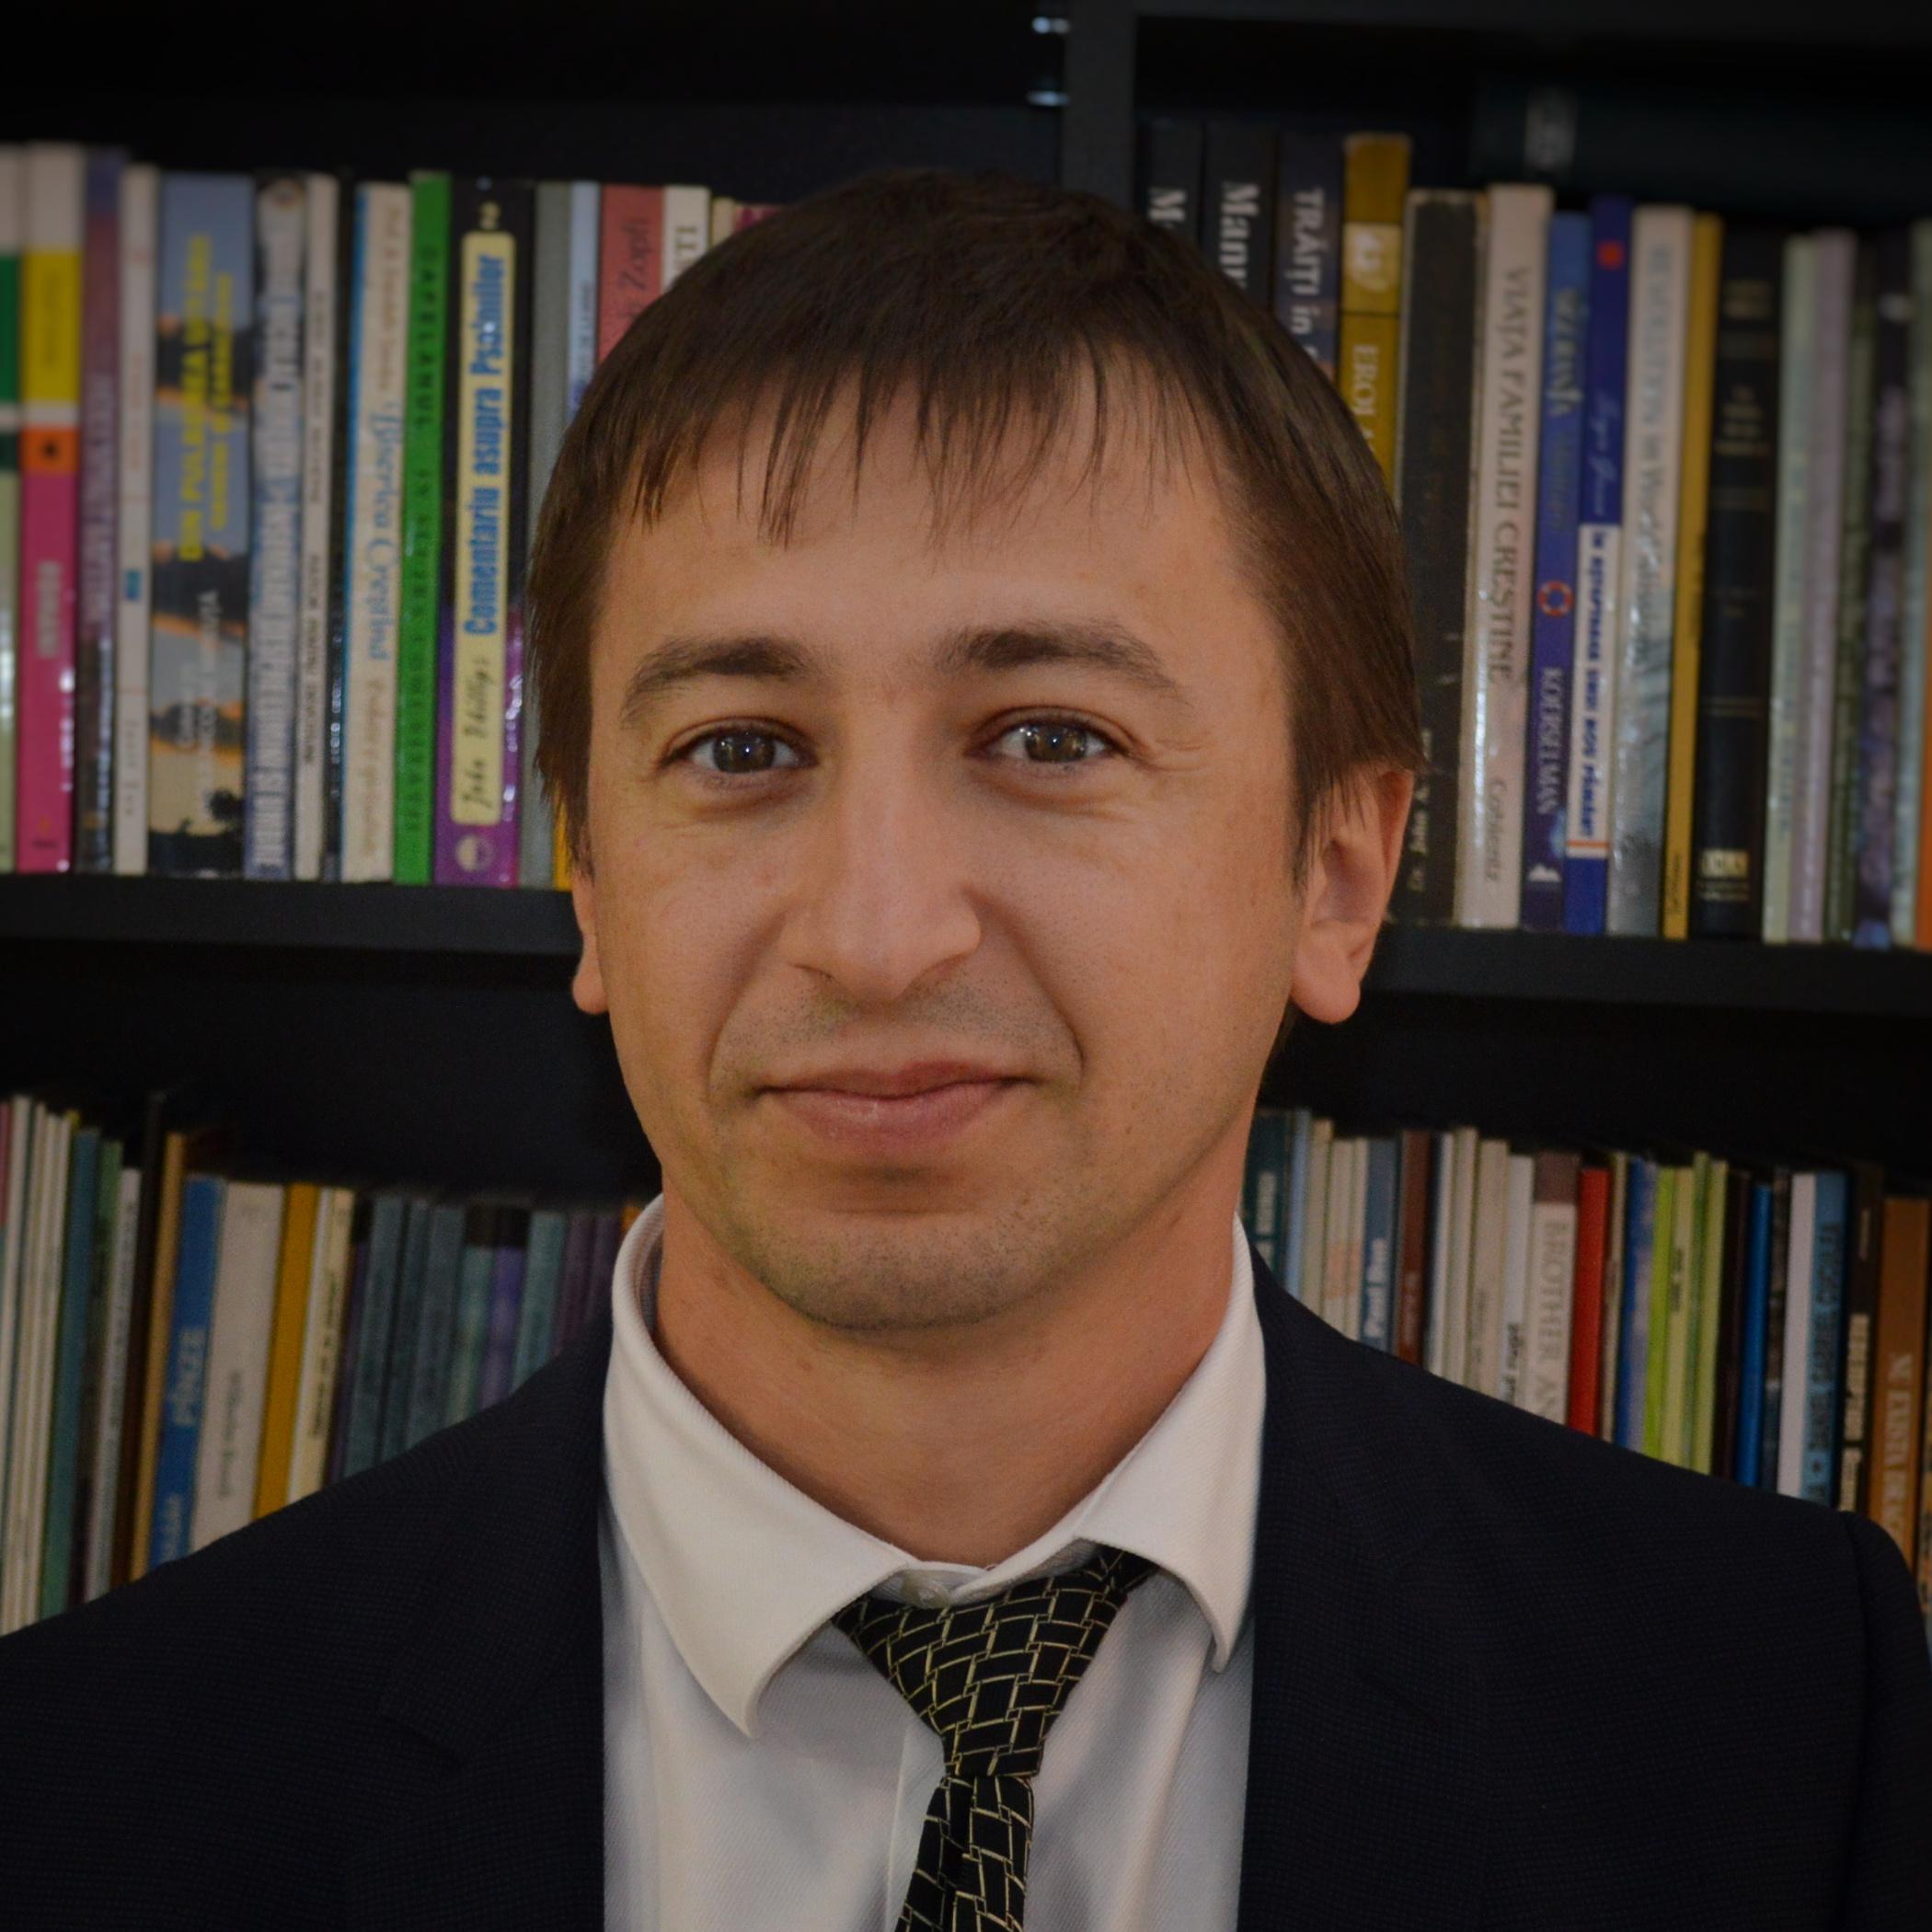 Pastor asistent Adriaj Jurj